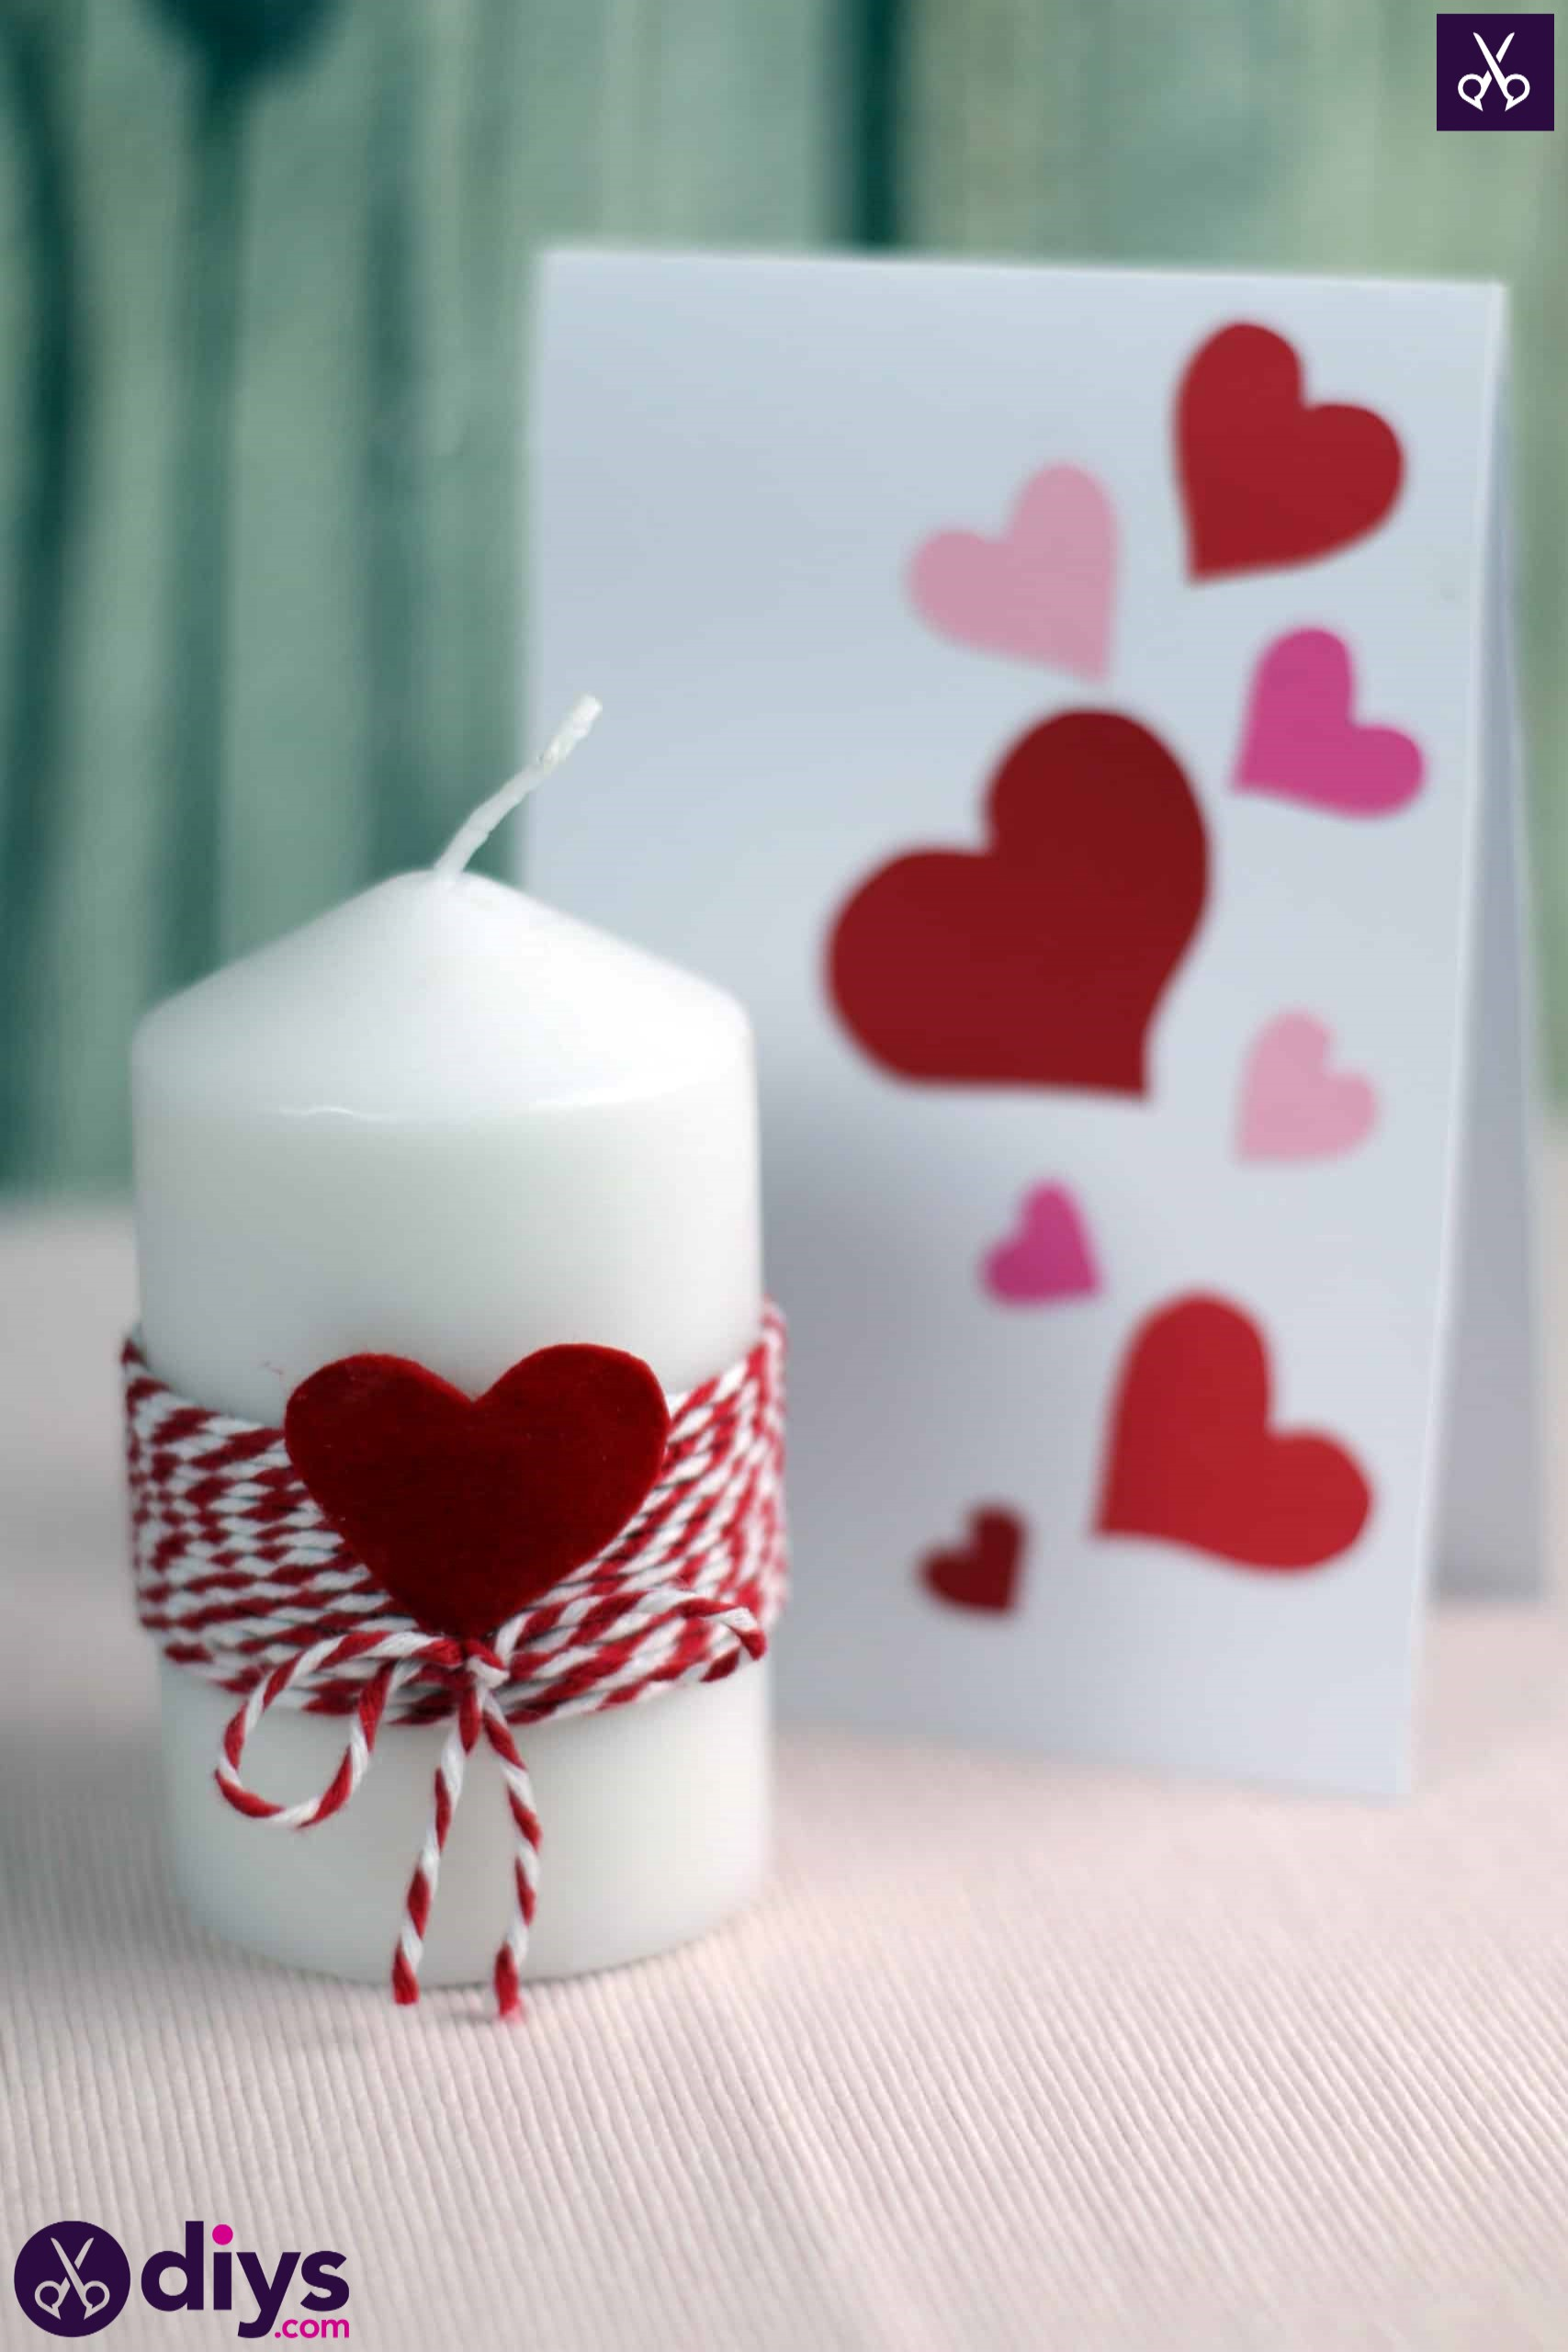 Diy valentine's candle